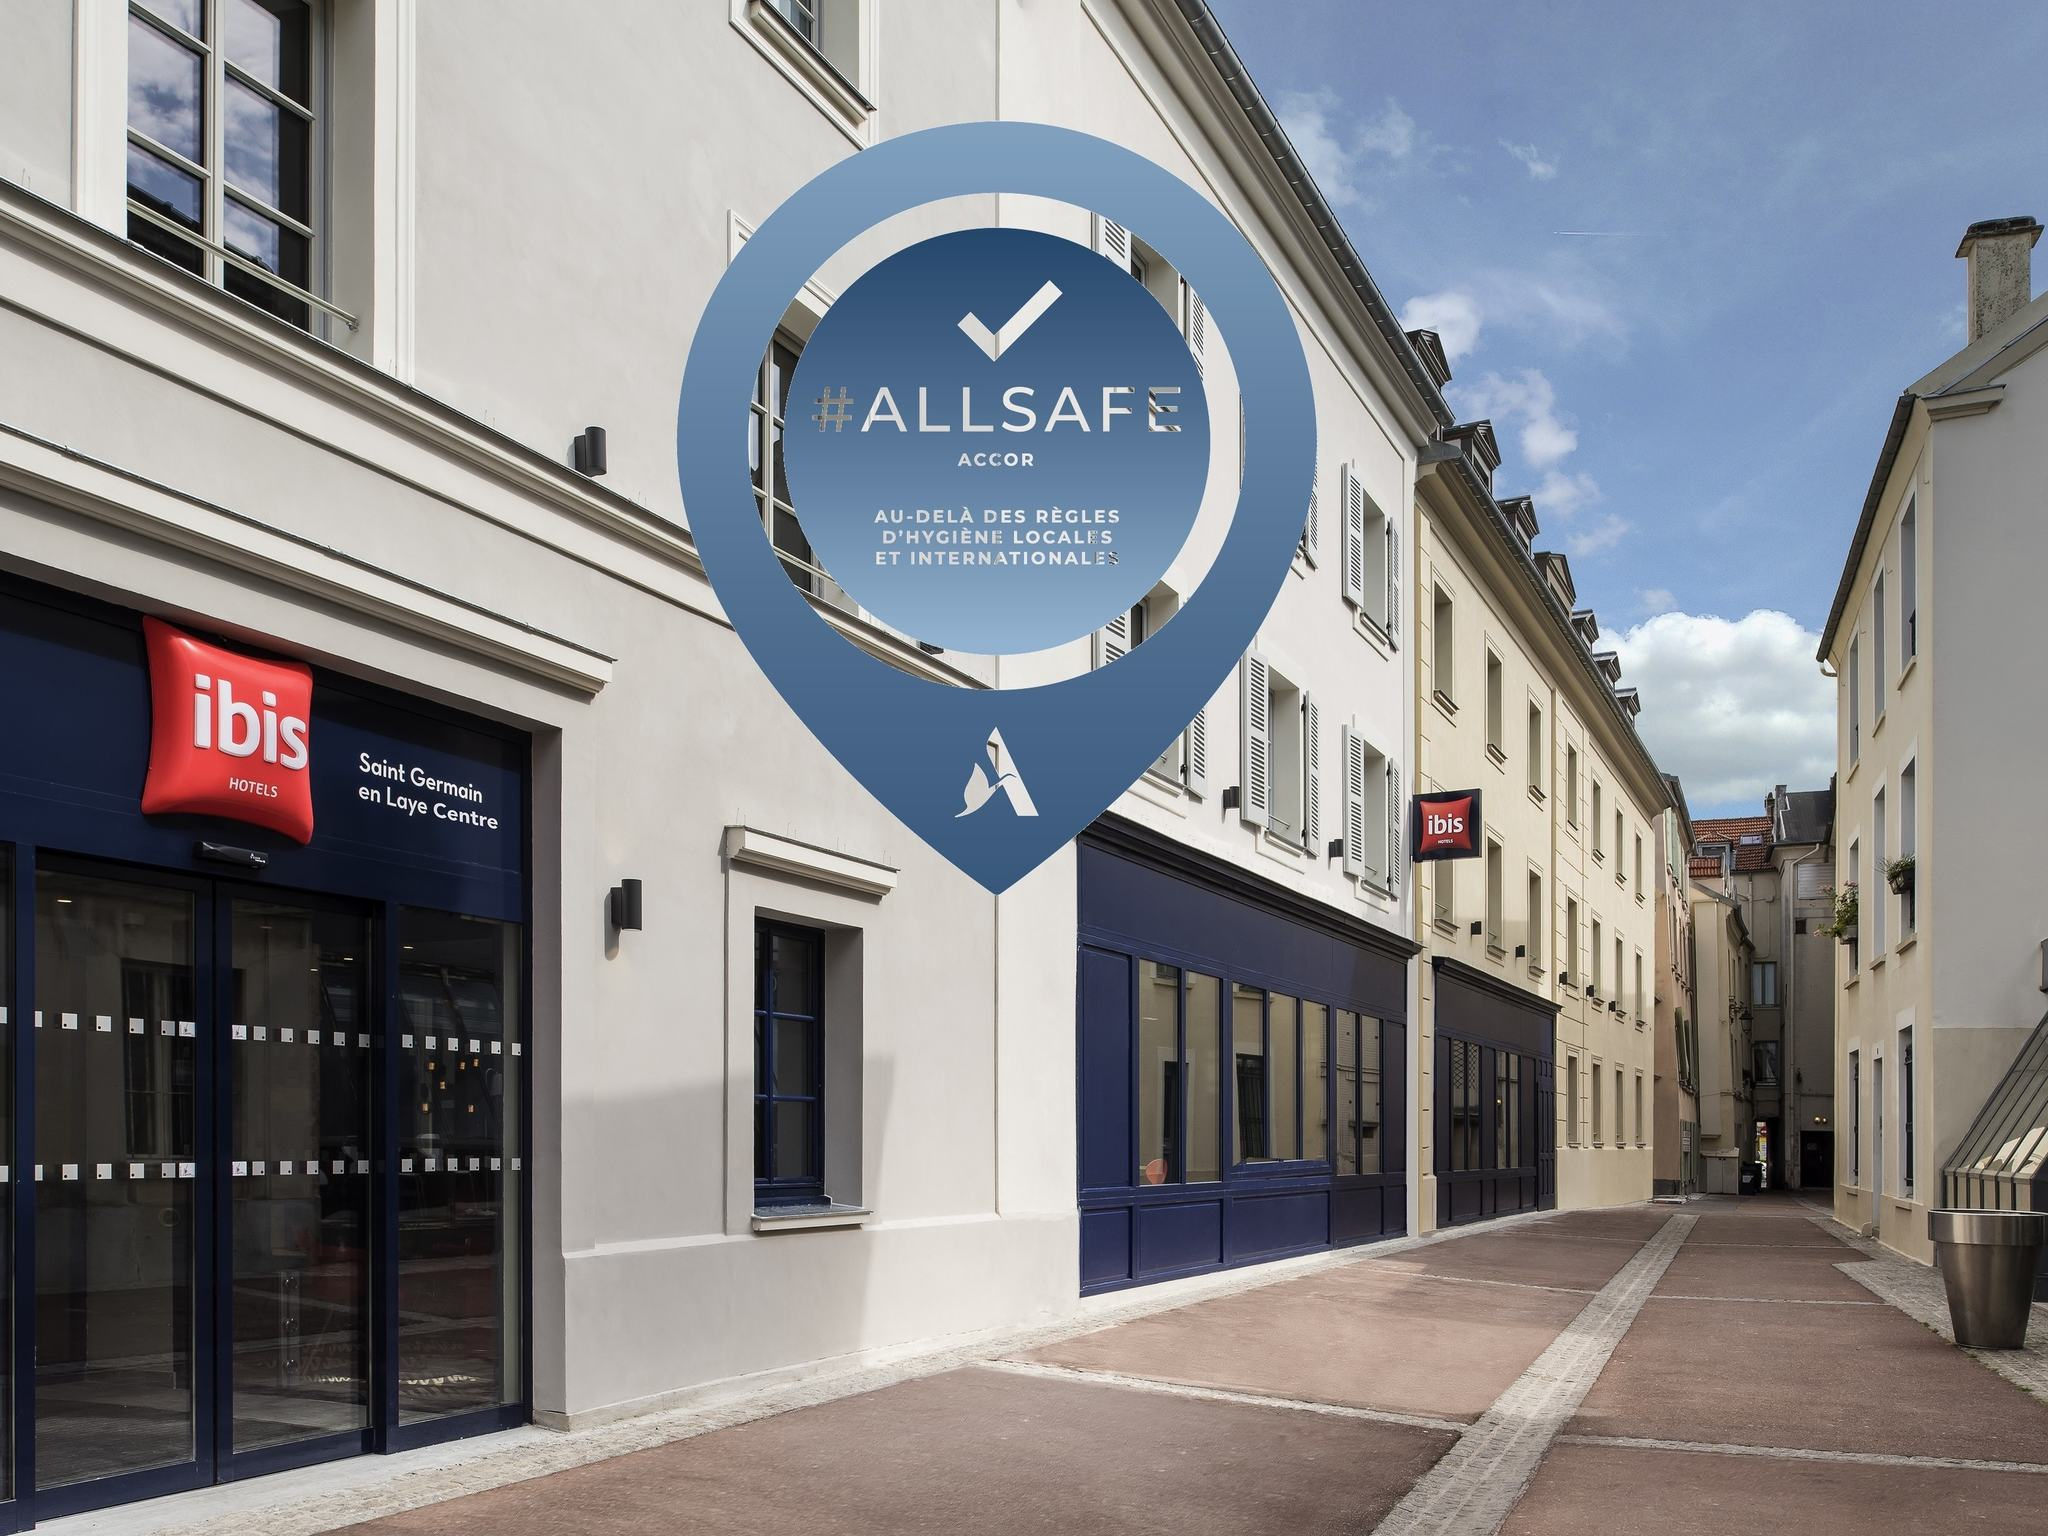 Hôtel - ibis Saint-Germain-en-Laye Centre